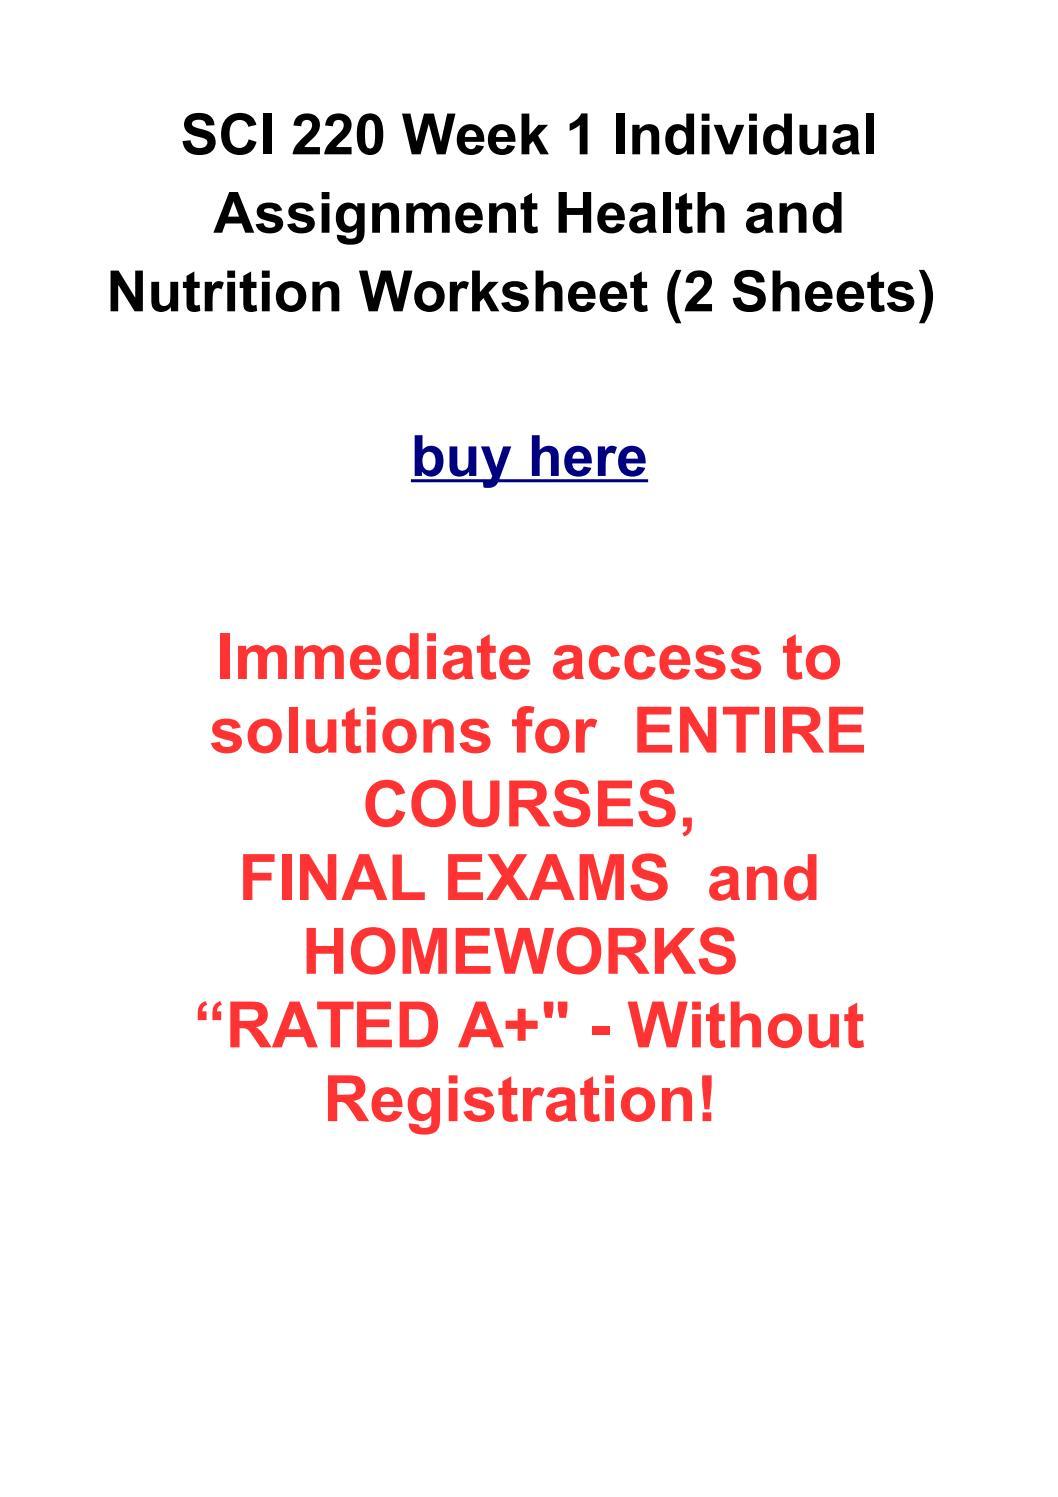 diet and activity plan sci220 essay